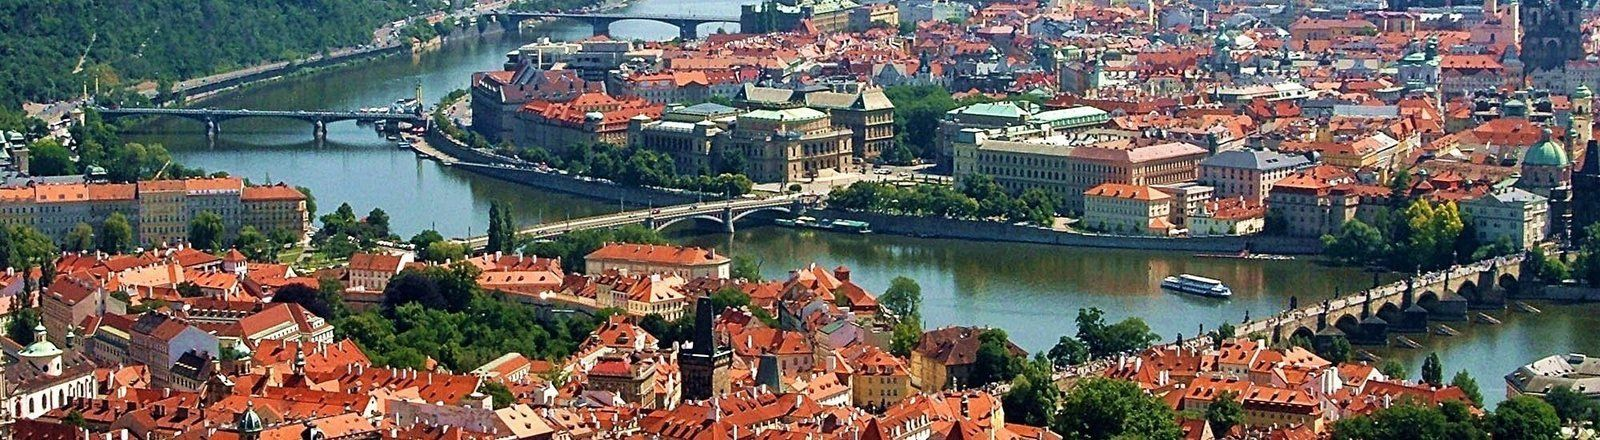 Image result for fshoq.com